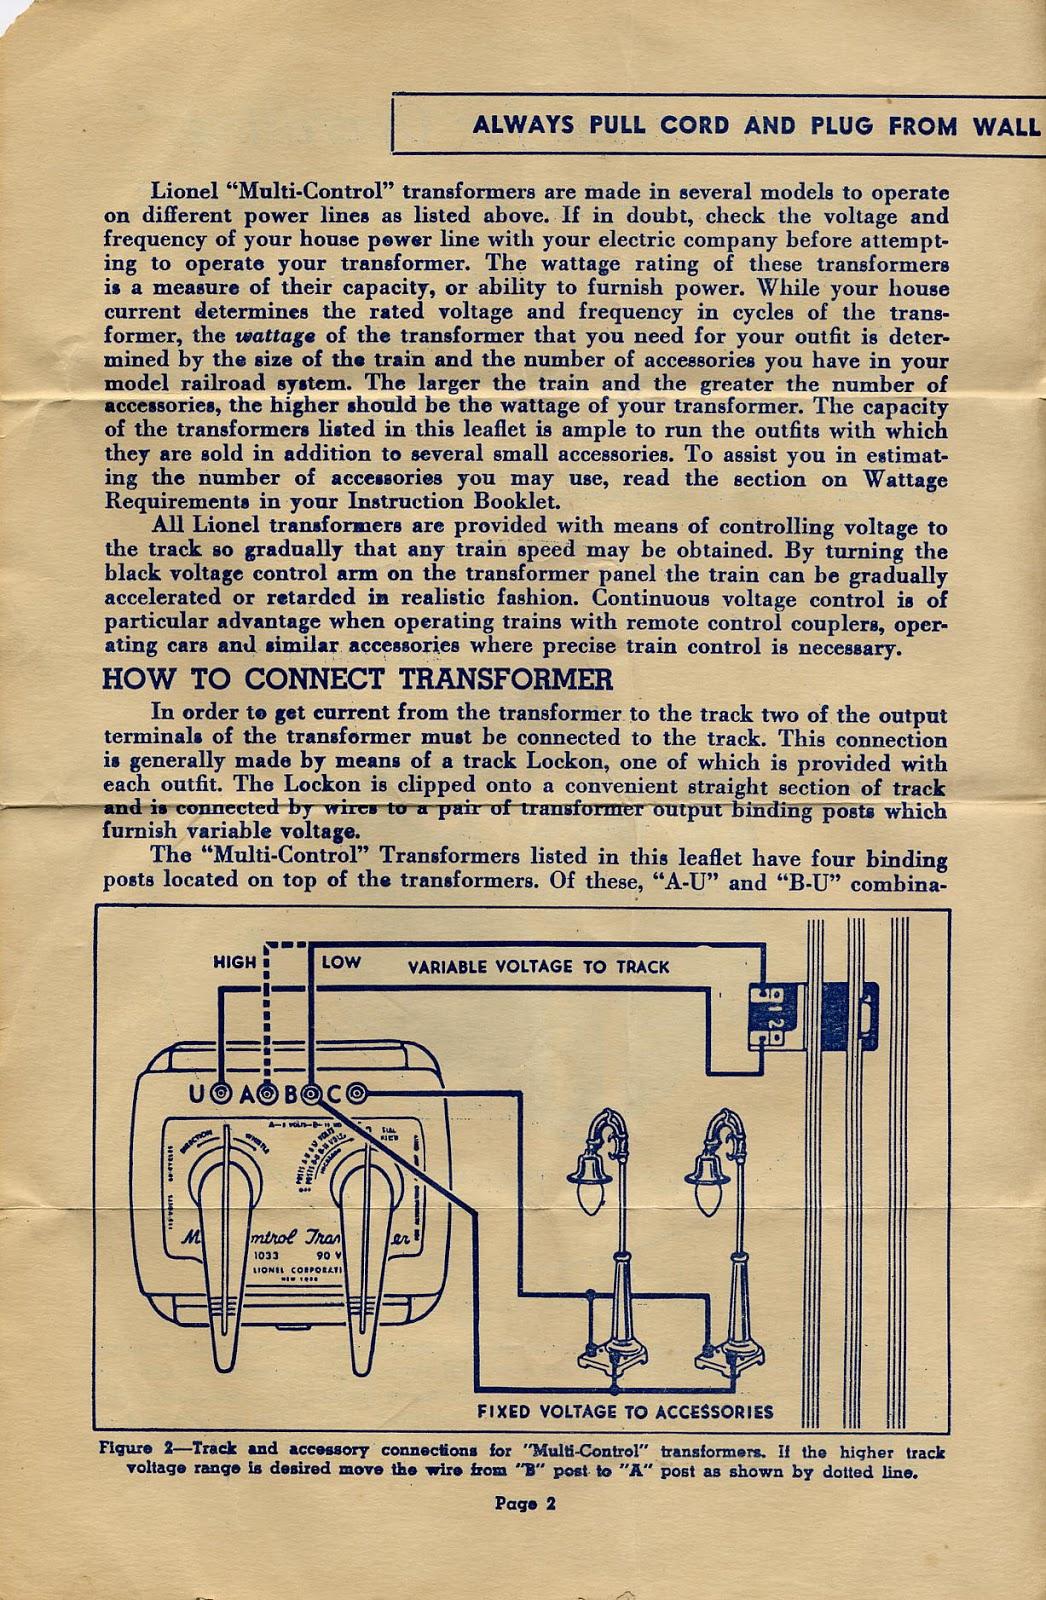 small resolution of lionel postwar wiring diagrams model train wiring diagrams lionel kw transformer wiring diagram lionel 1033 transformer